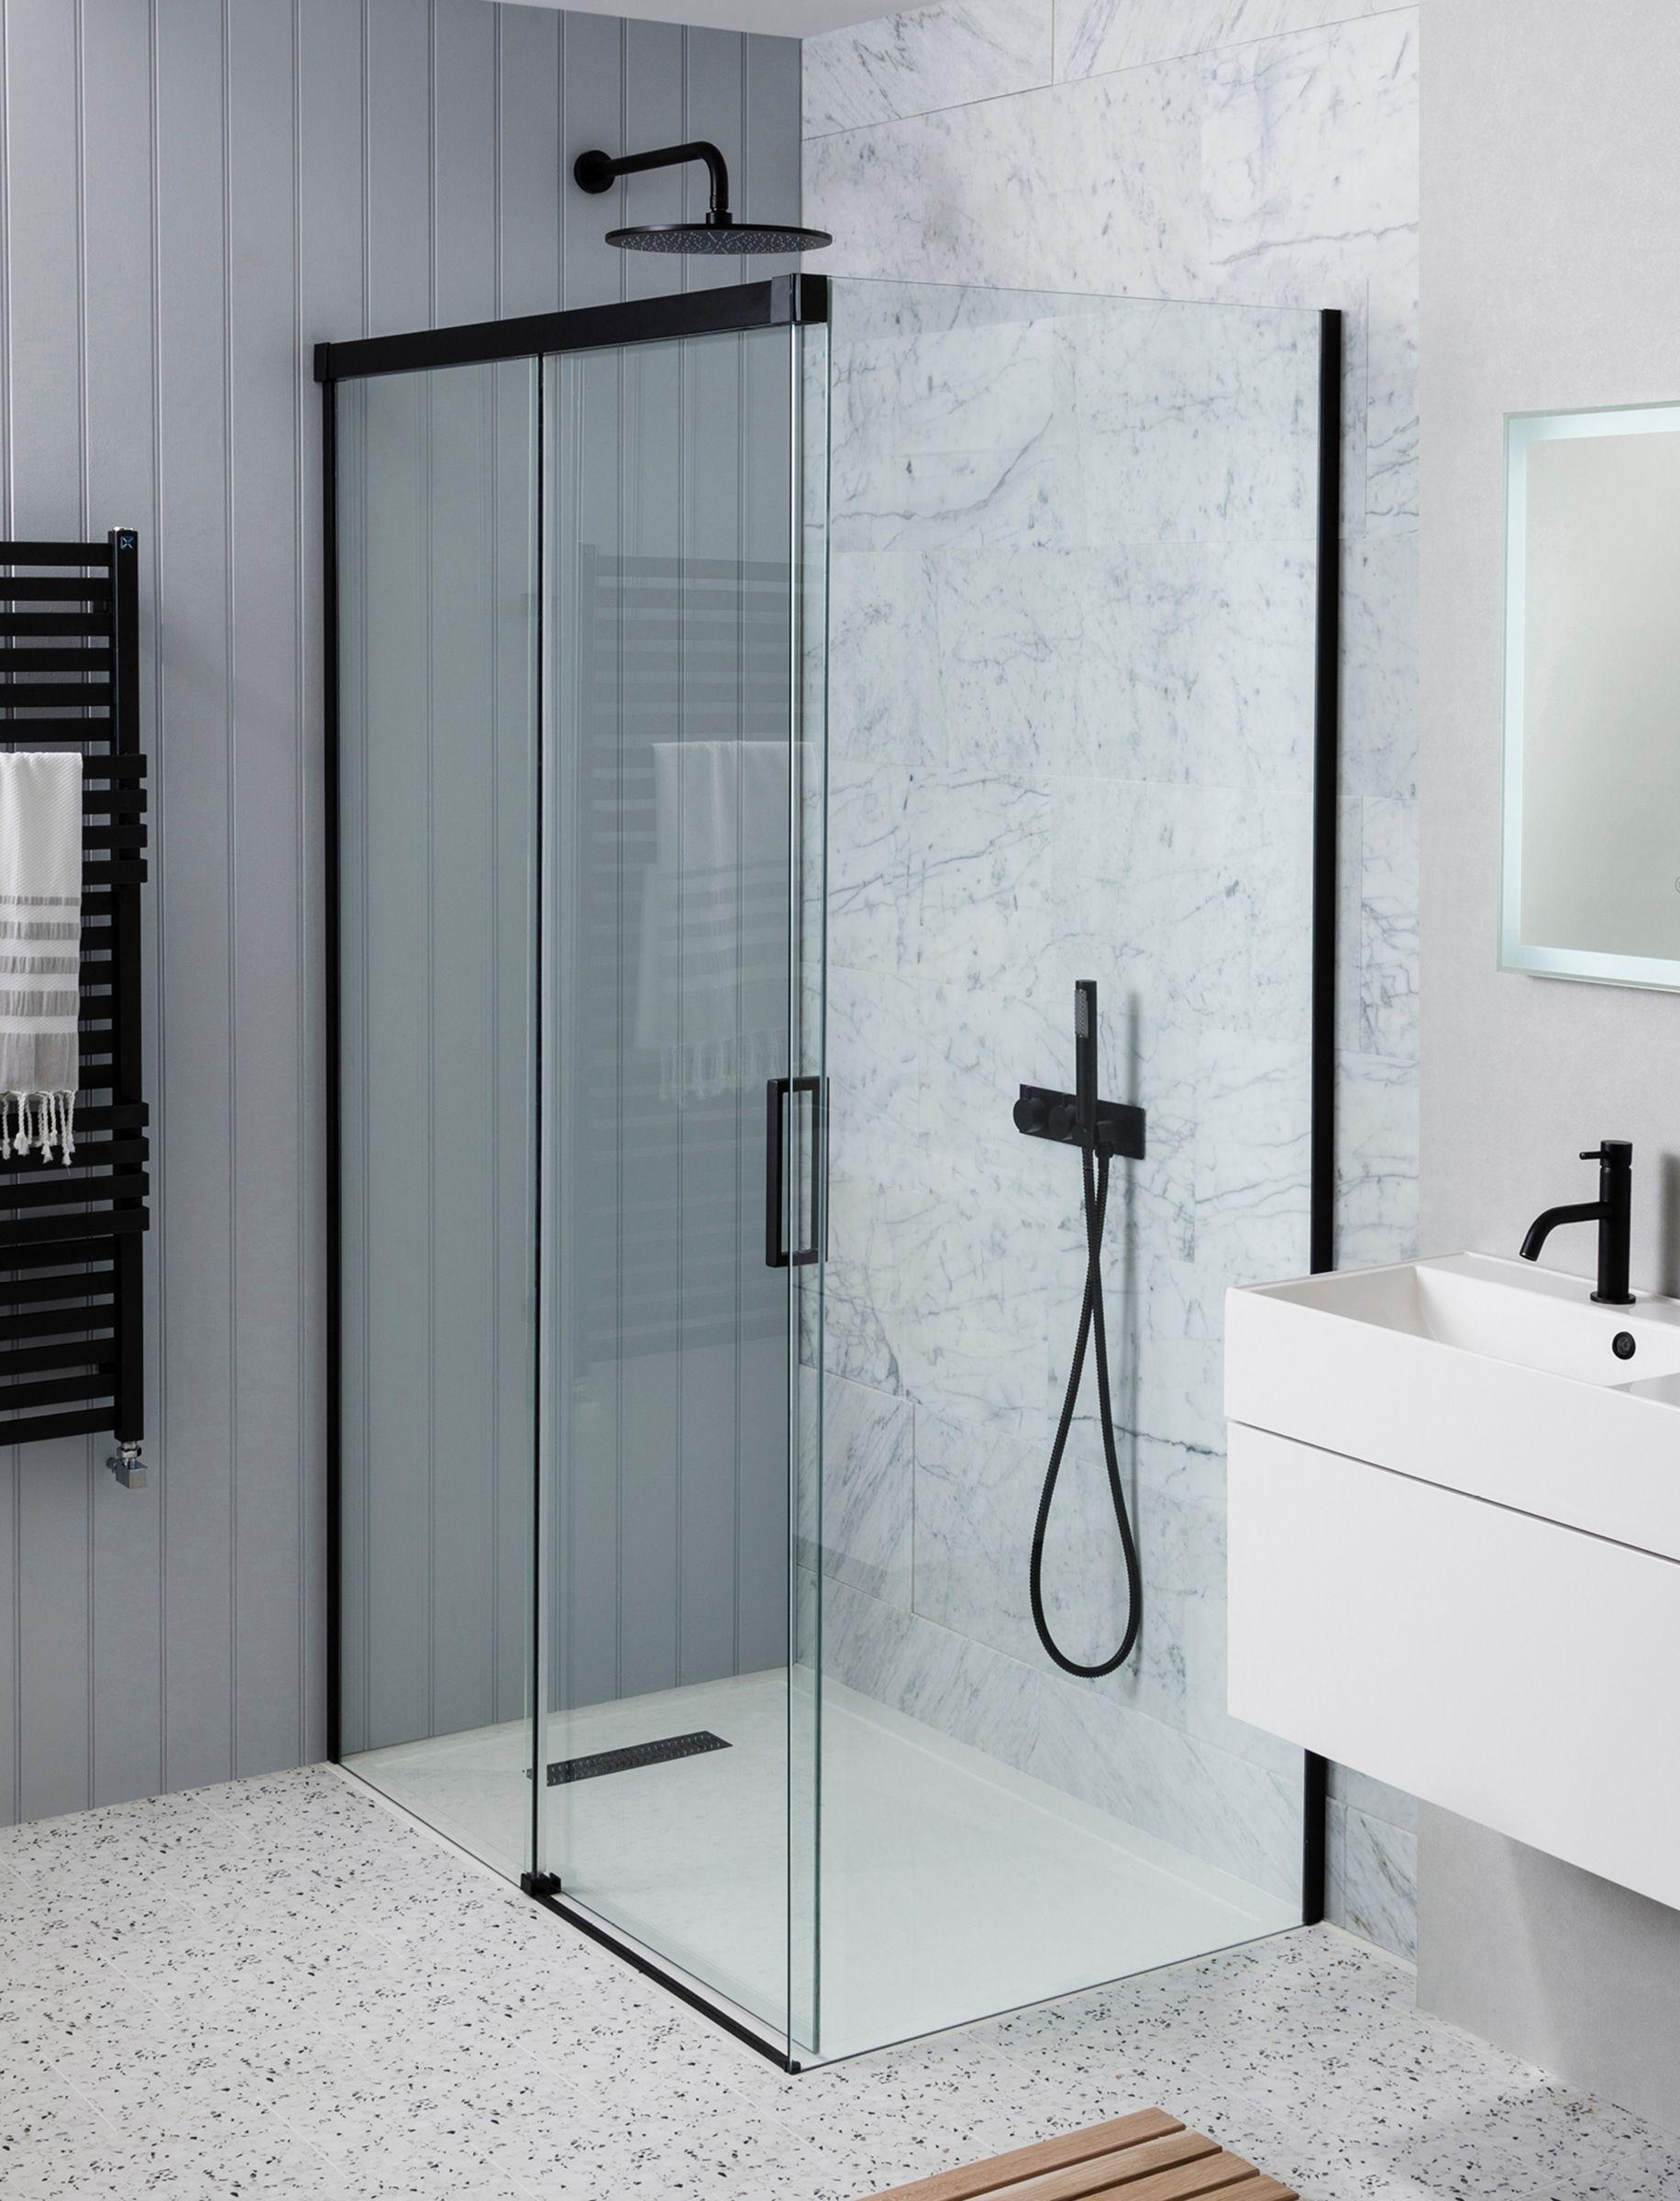 10 Luxury Shower Room Design Ideas To Make Delightful Bathing Shower Doors Sliding Shower Door Luxury Shower